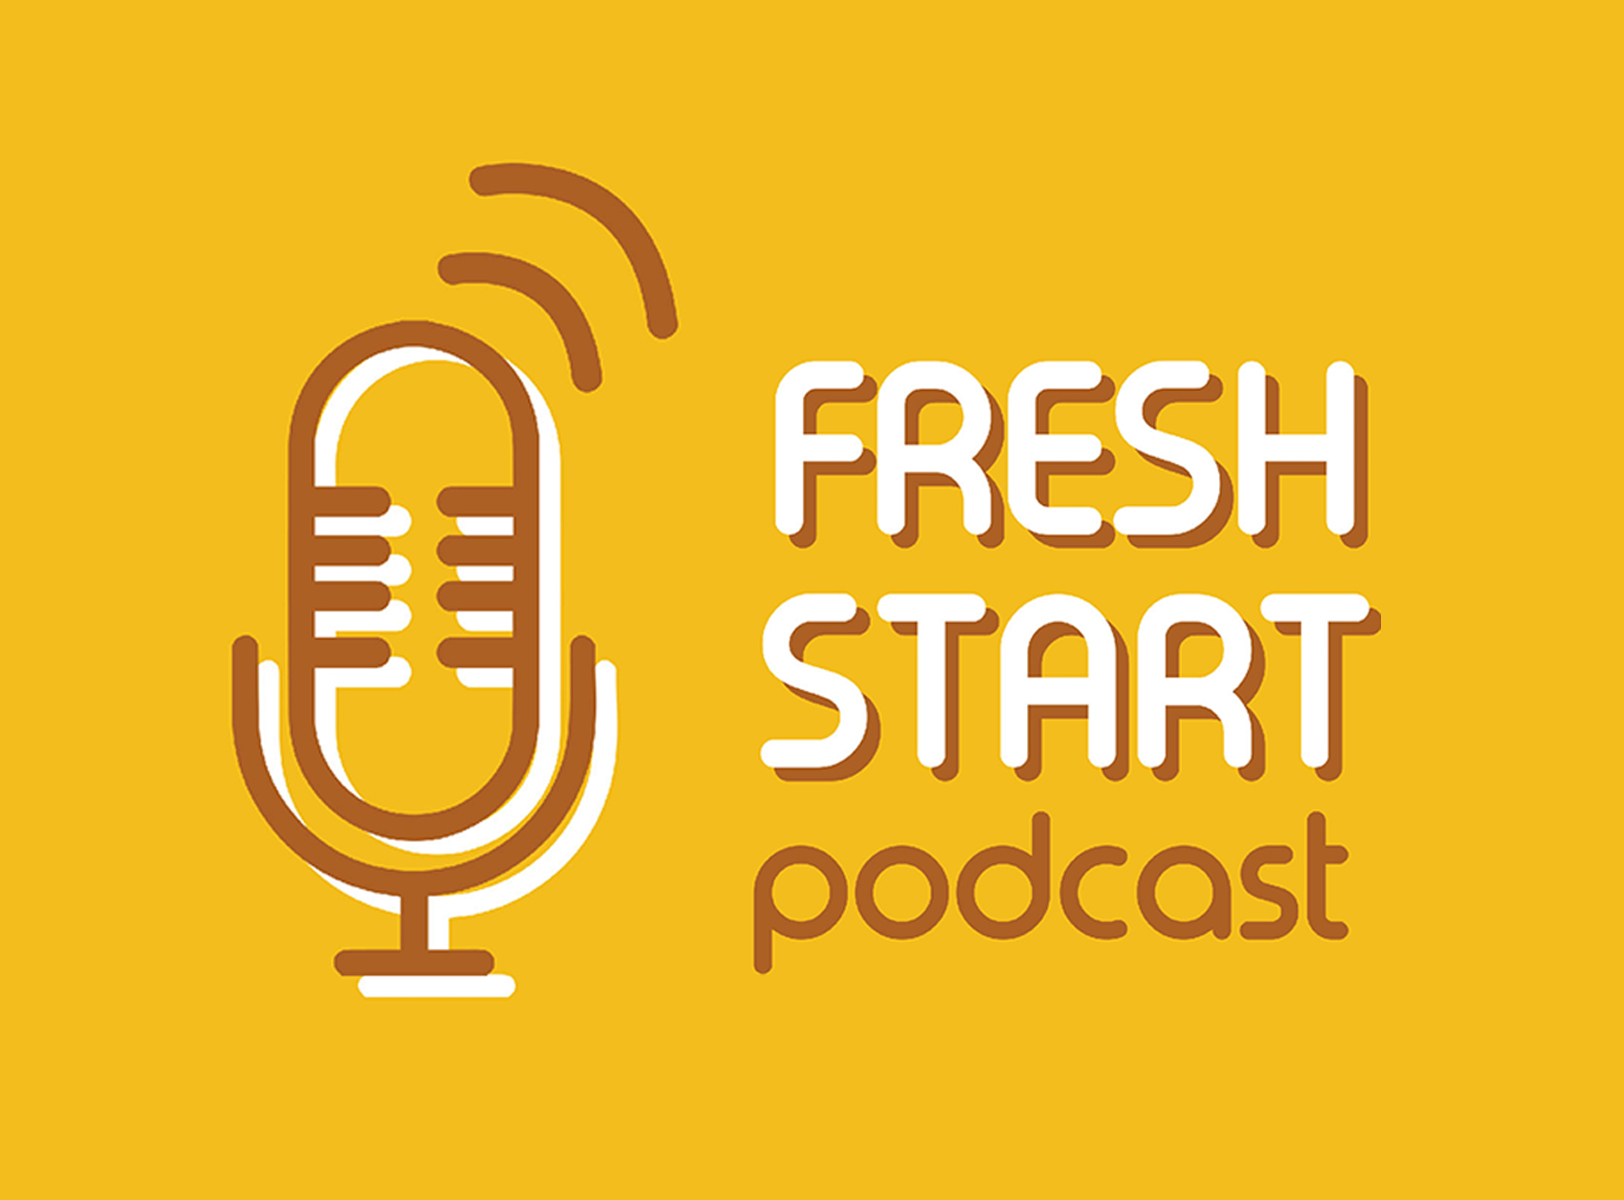 Fresh Start: Podcast News (1/20/2019 Sun.)